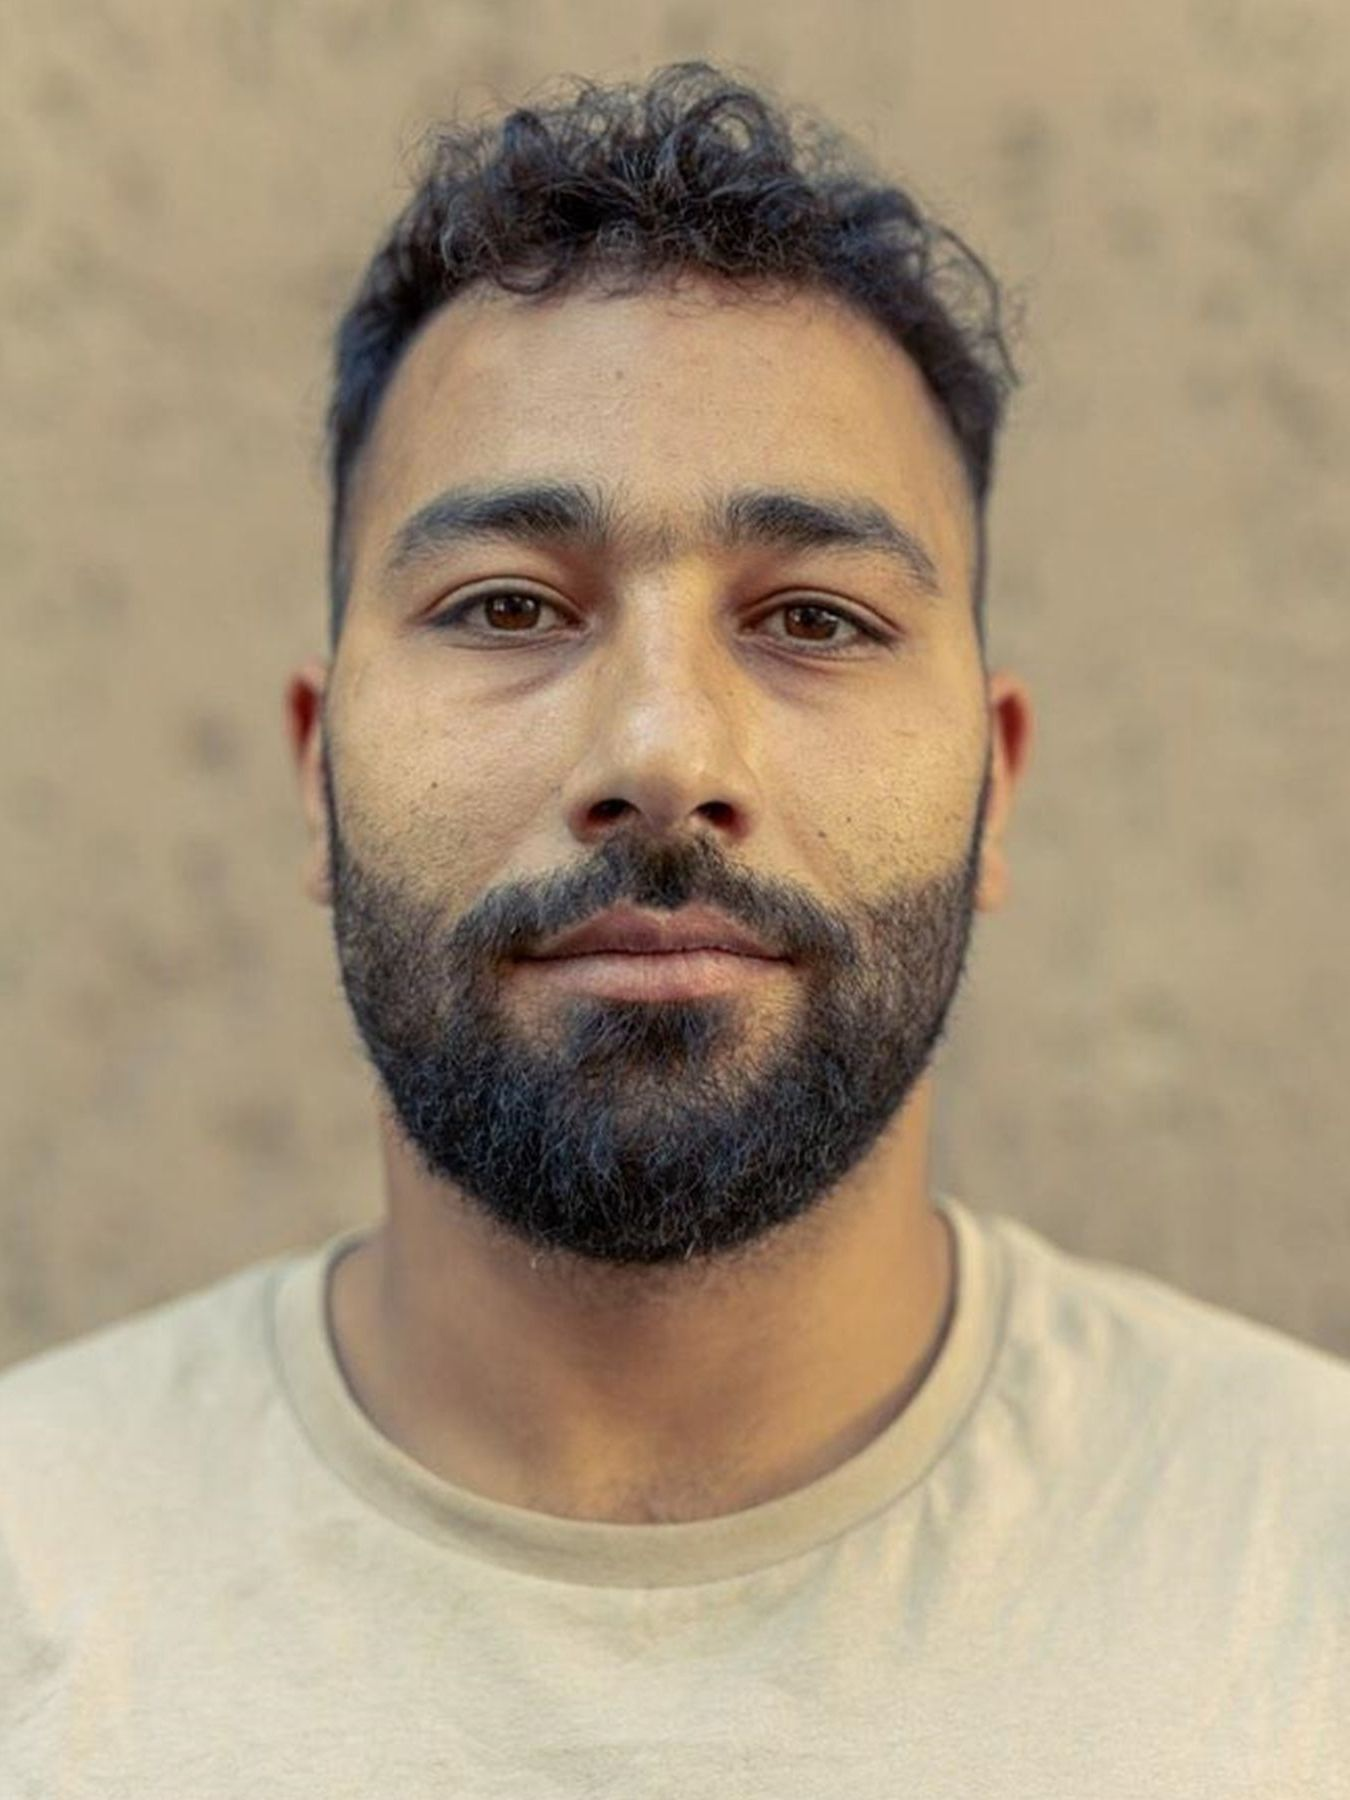 Ibrahim Al-Khalil, Actors Agency Osman, Schauspielagentur Berlin